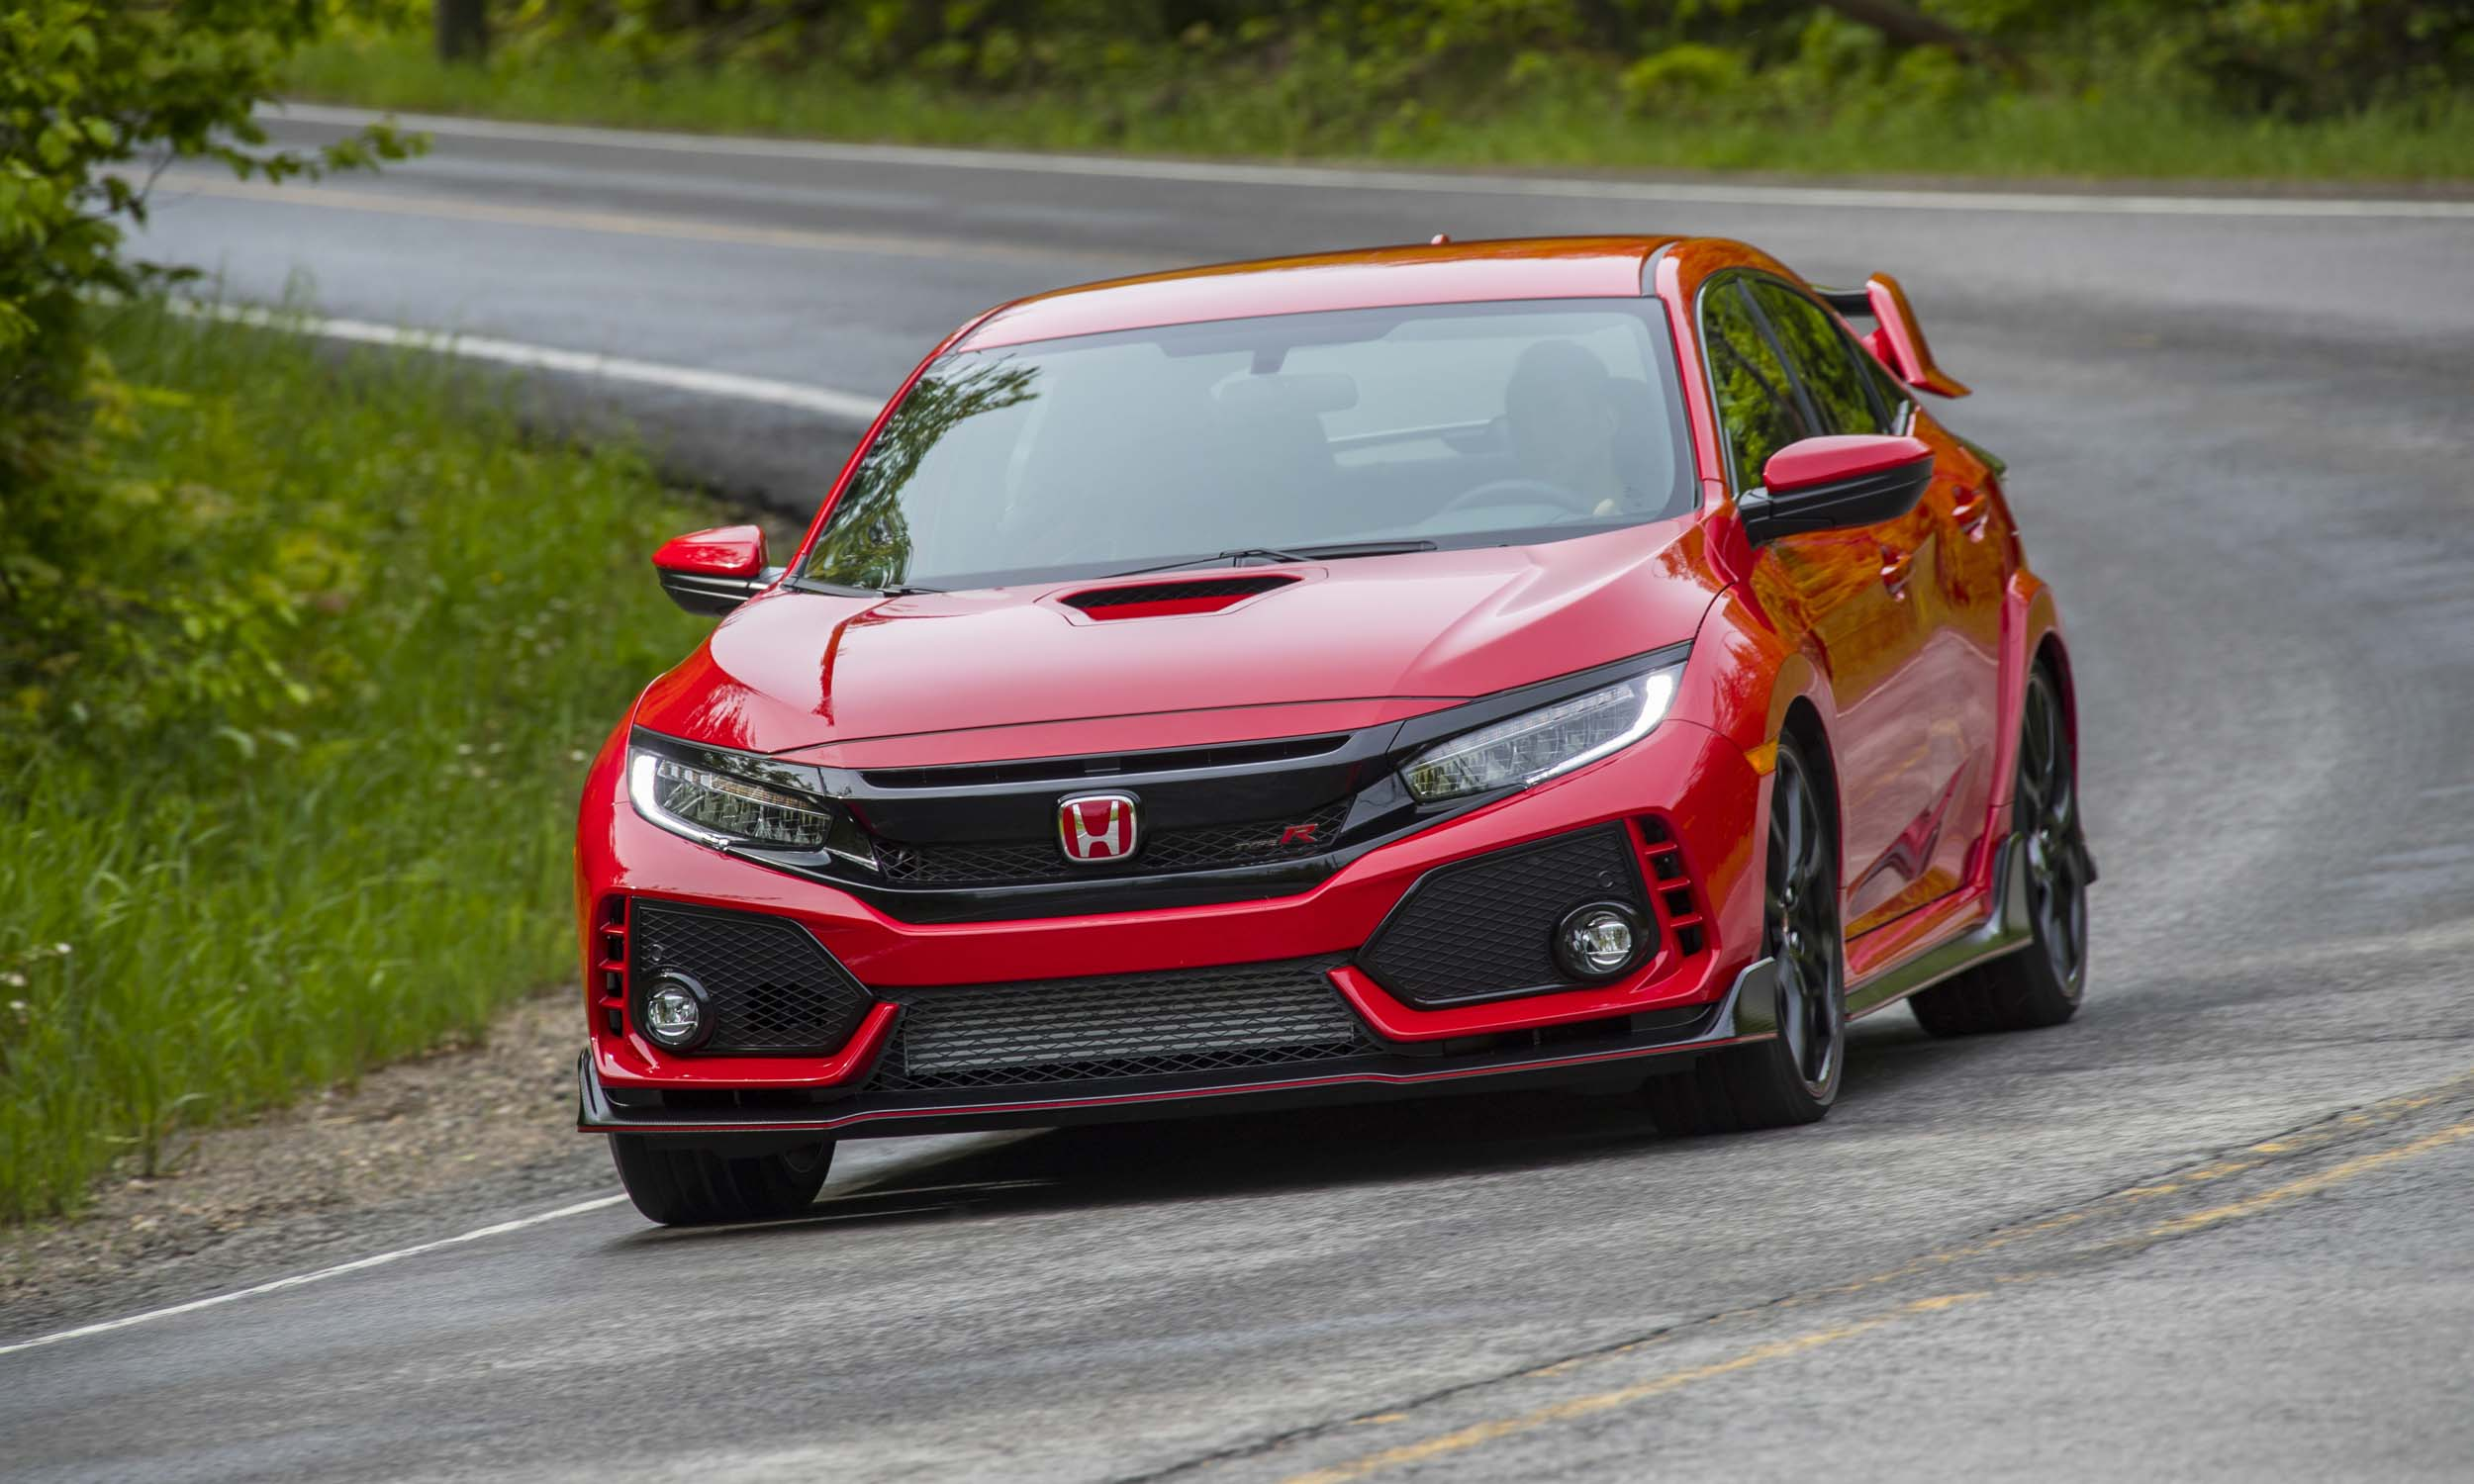 Track happy street cars autonxt for American honda motor co